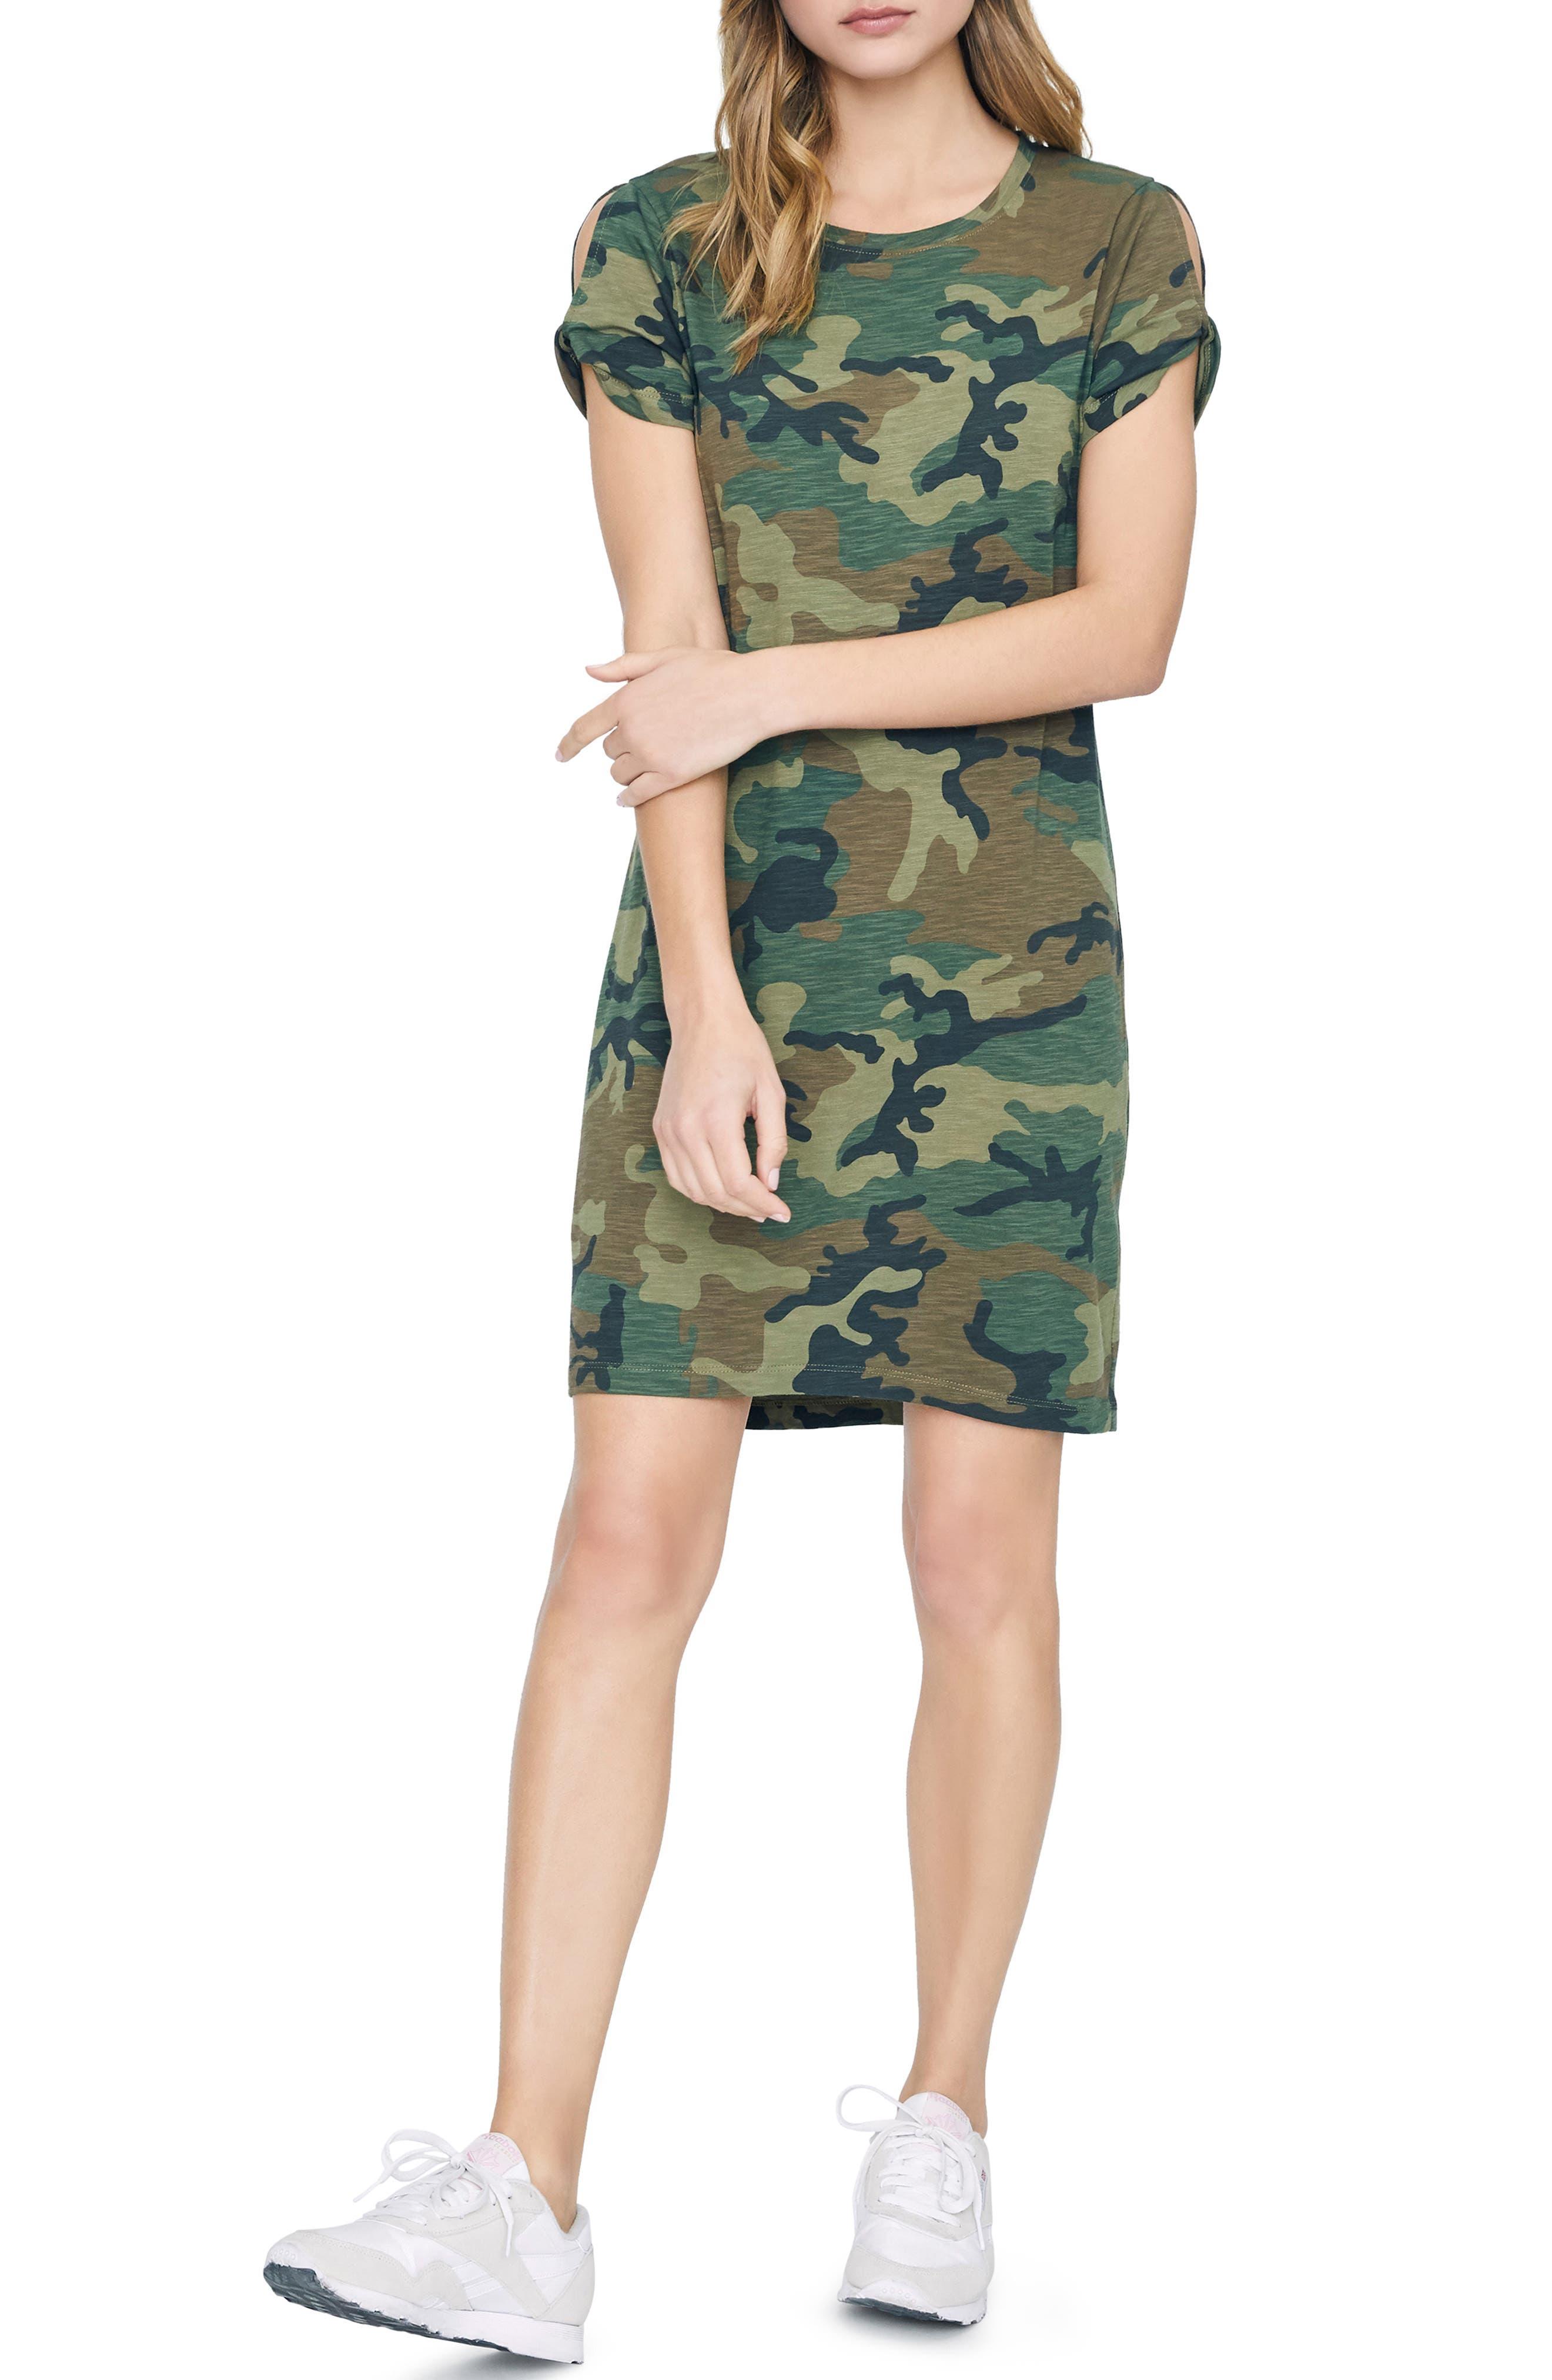 Sanctuary So Twisted Sleeve Detail Cotton Blend T-Shirt Dress, Green